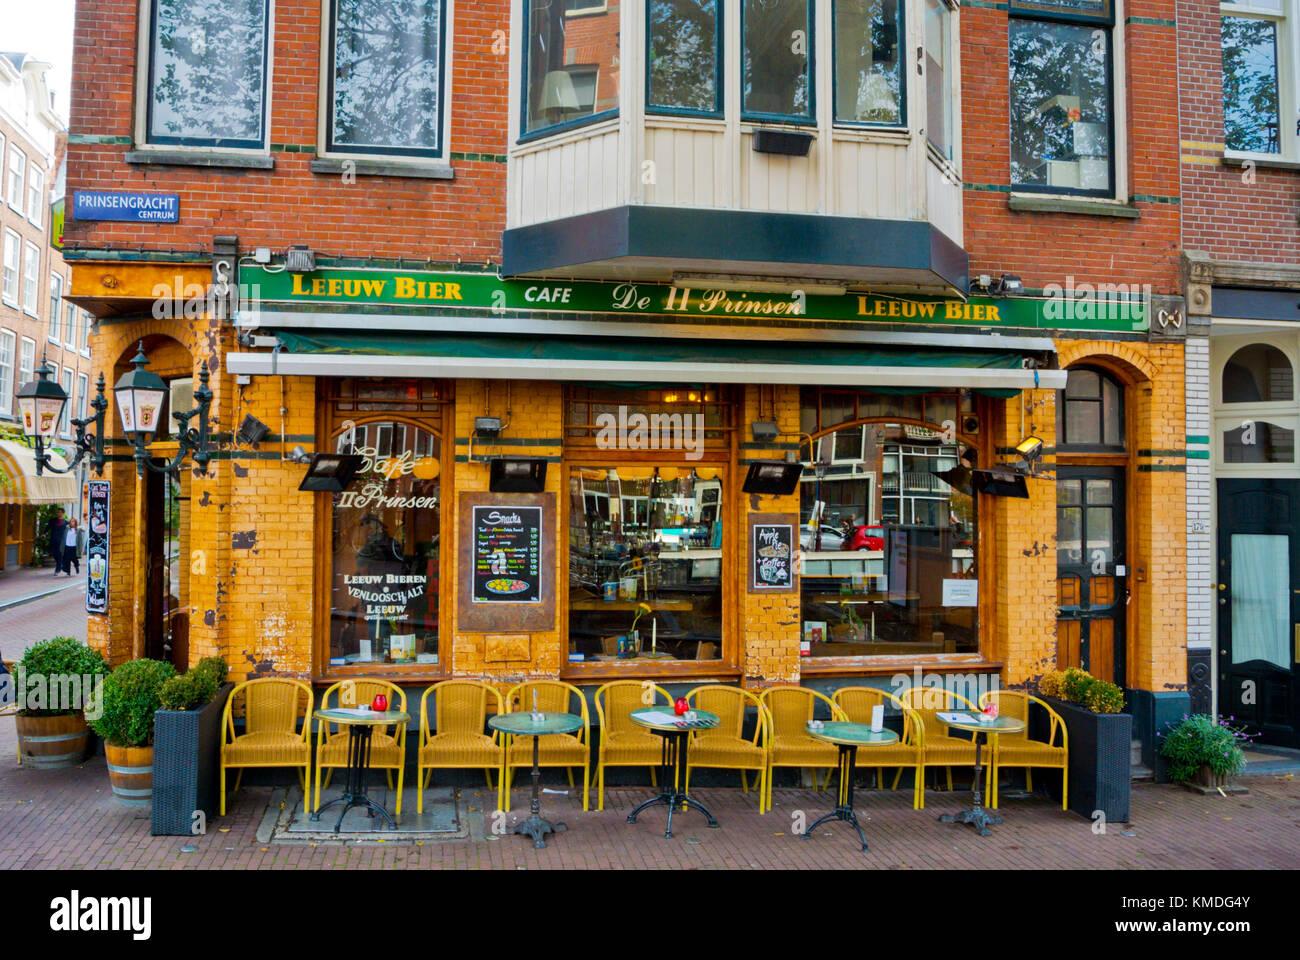 Cafe bar, Prinsengracht, Amsterdam, The Netherlands - Stock Image